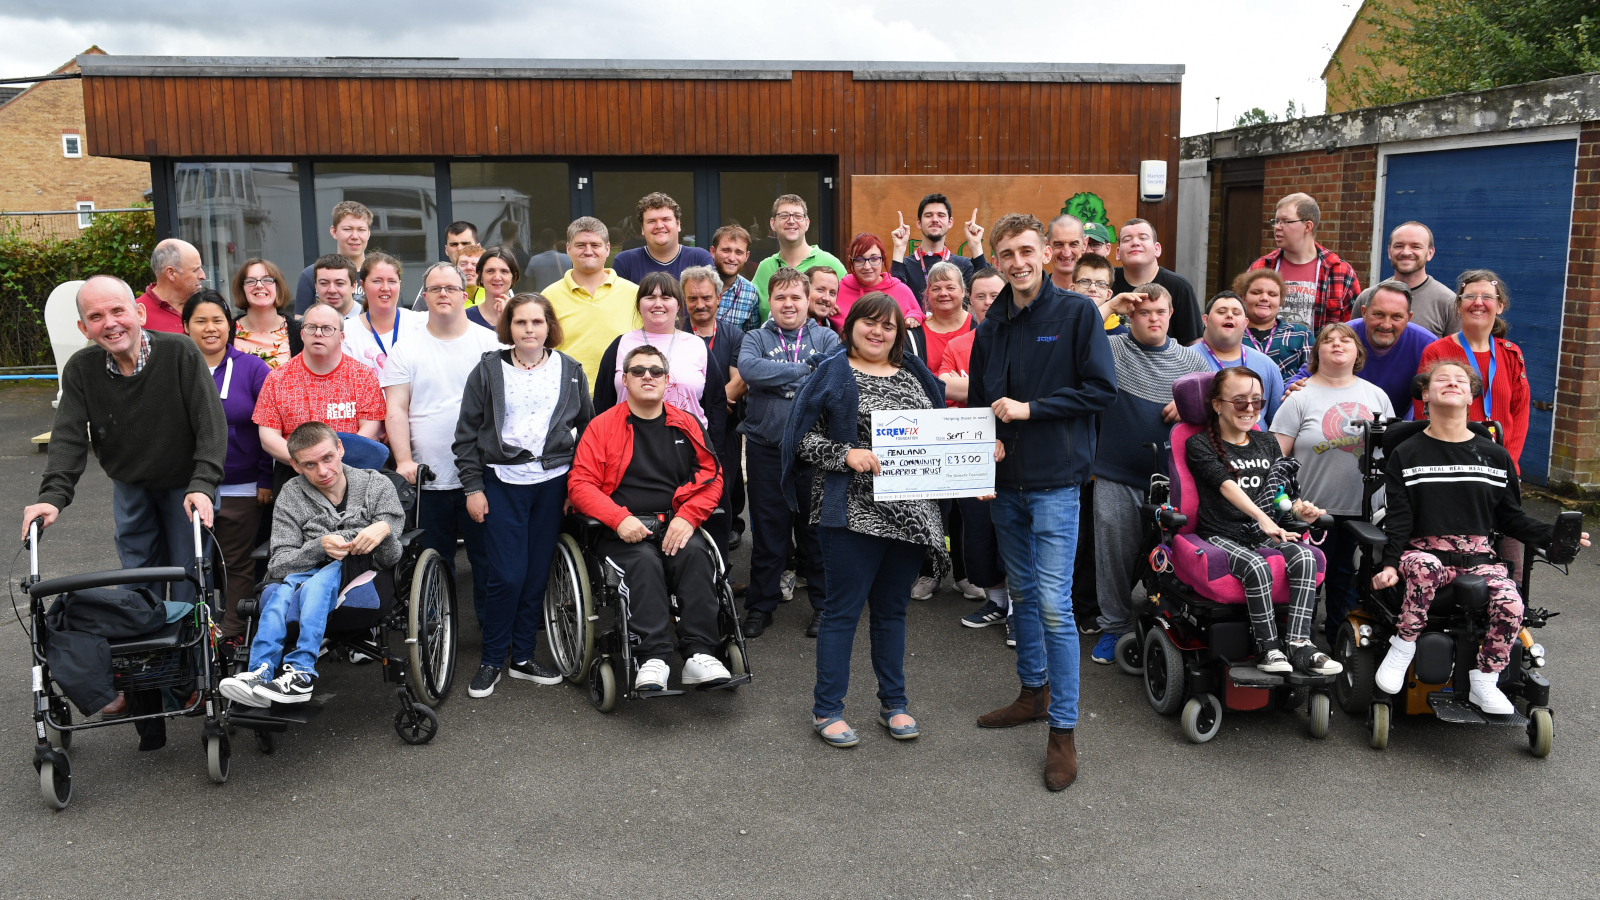 The Screwfix Foundation supports Fenland Area Community Enterprise Trust